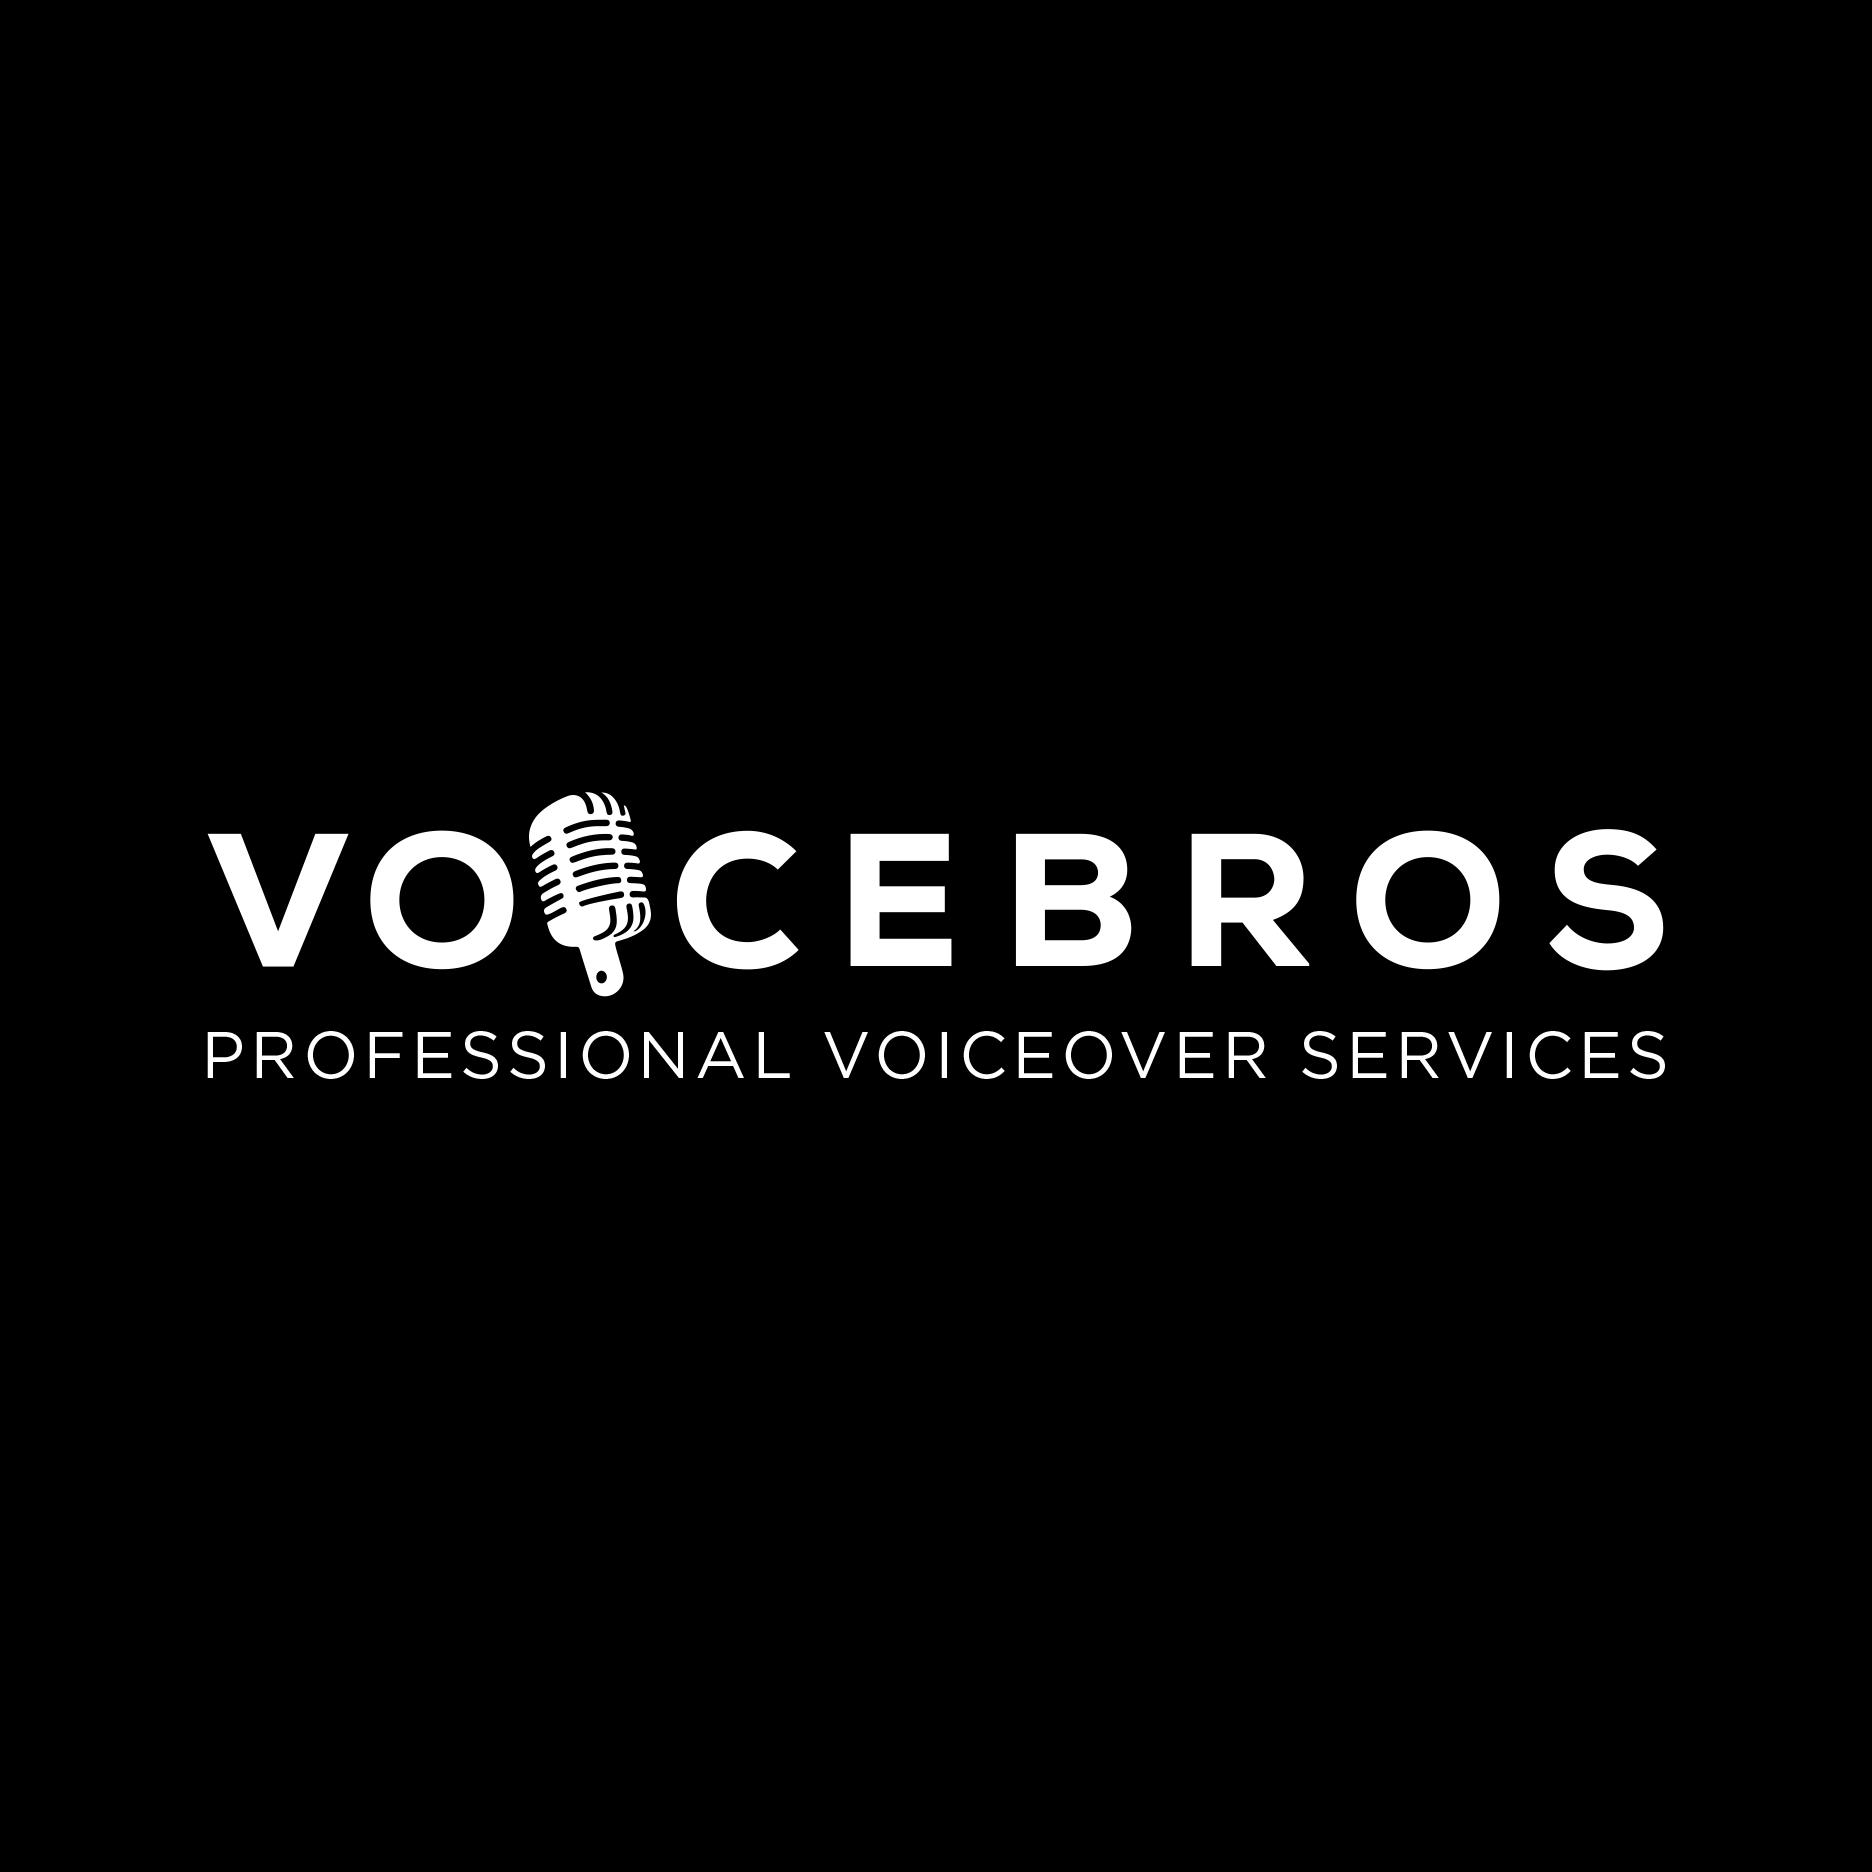 Thomas Sauermann is a voice over actor